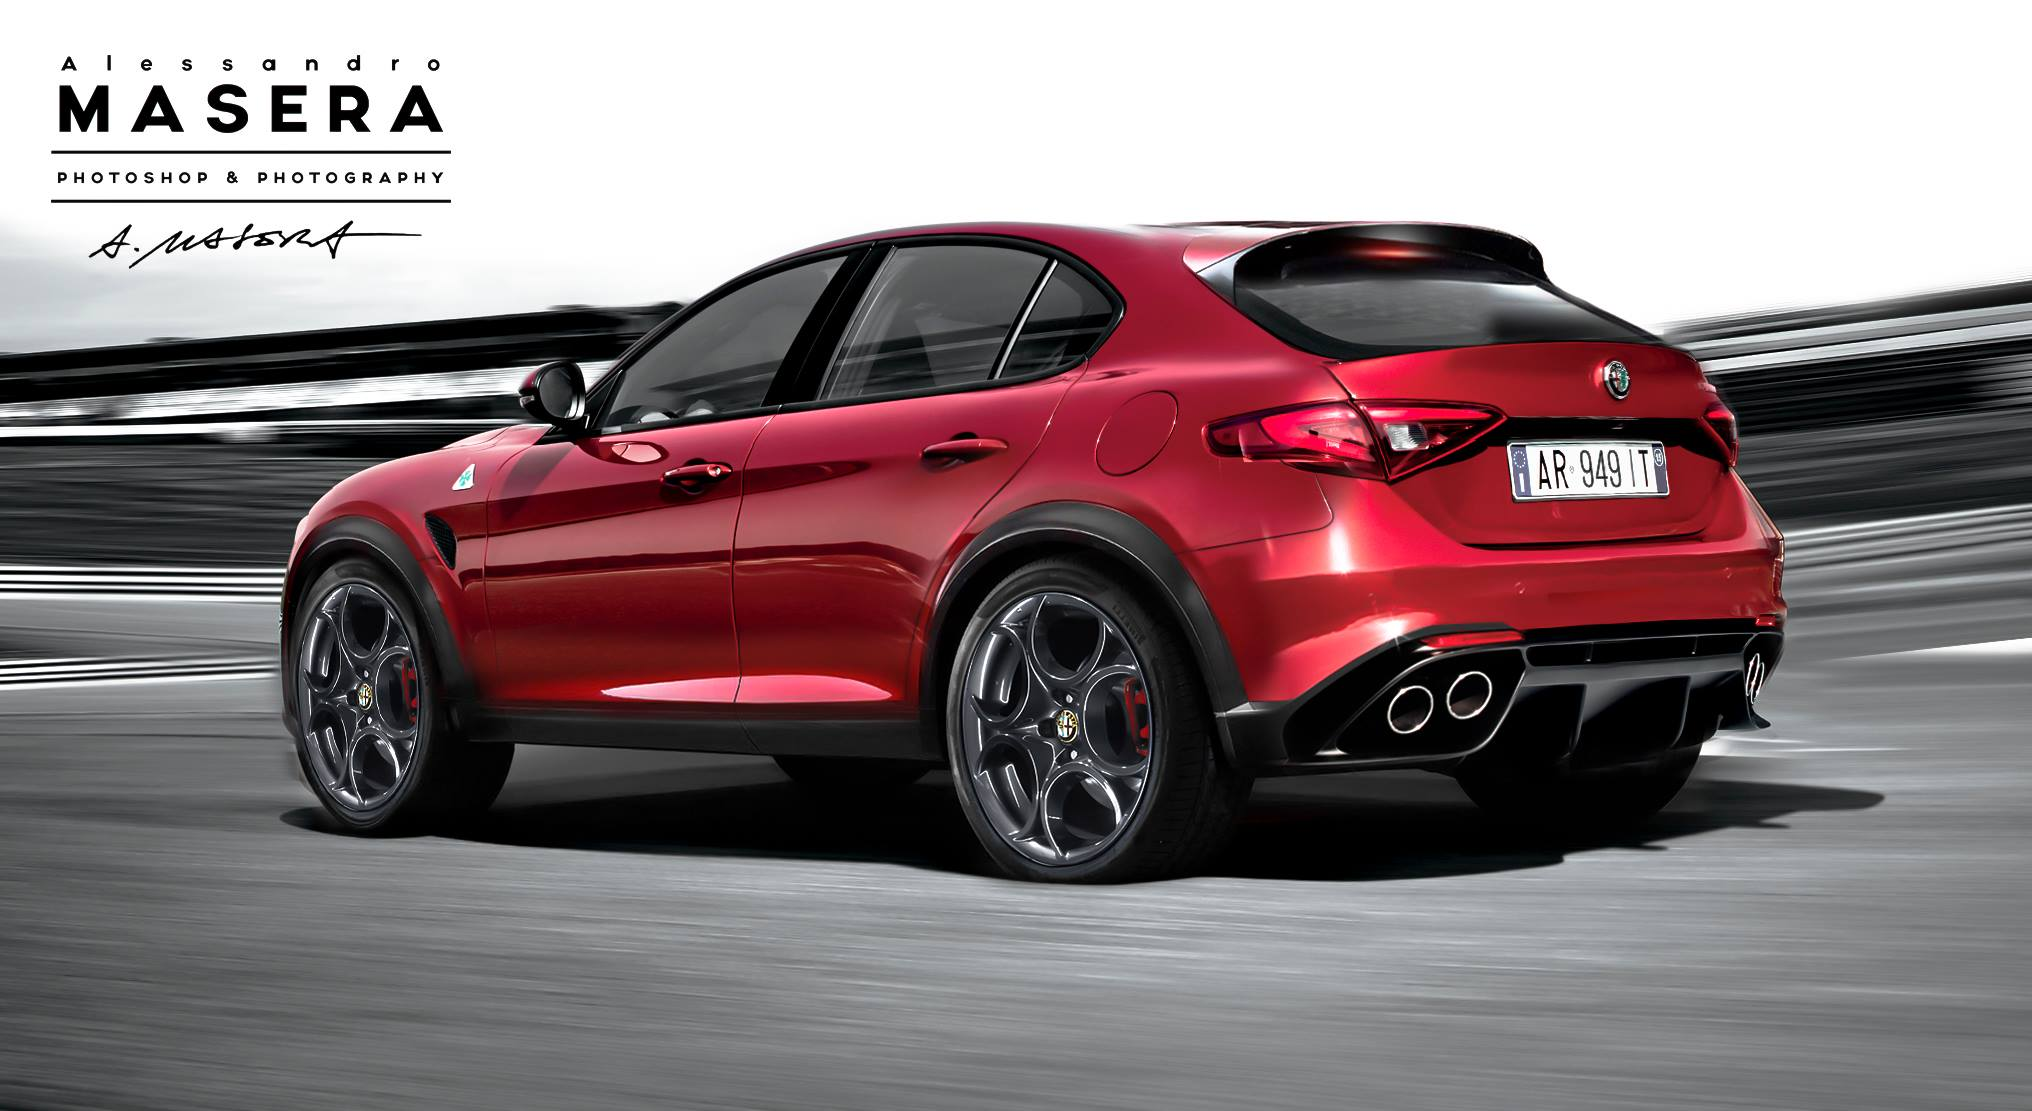 Alfa romeo giulietta model year 11